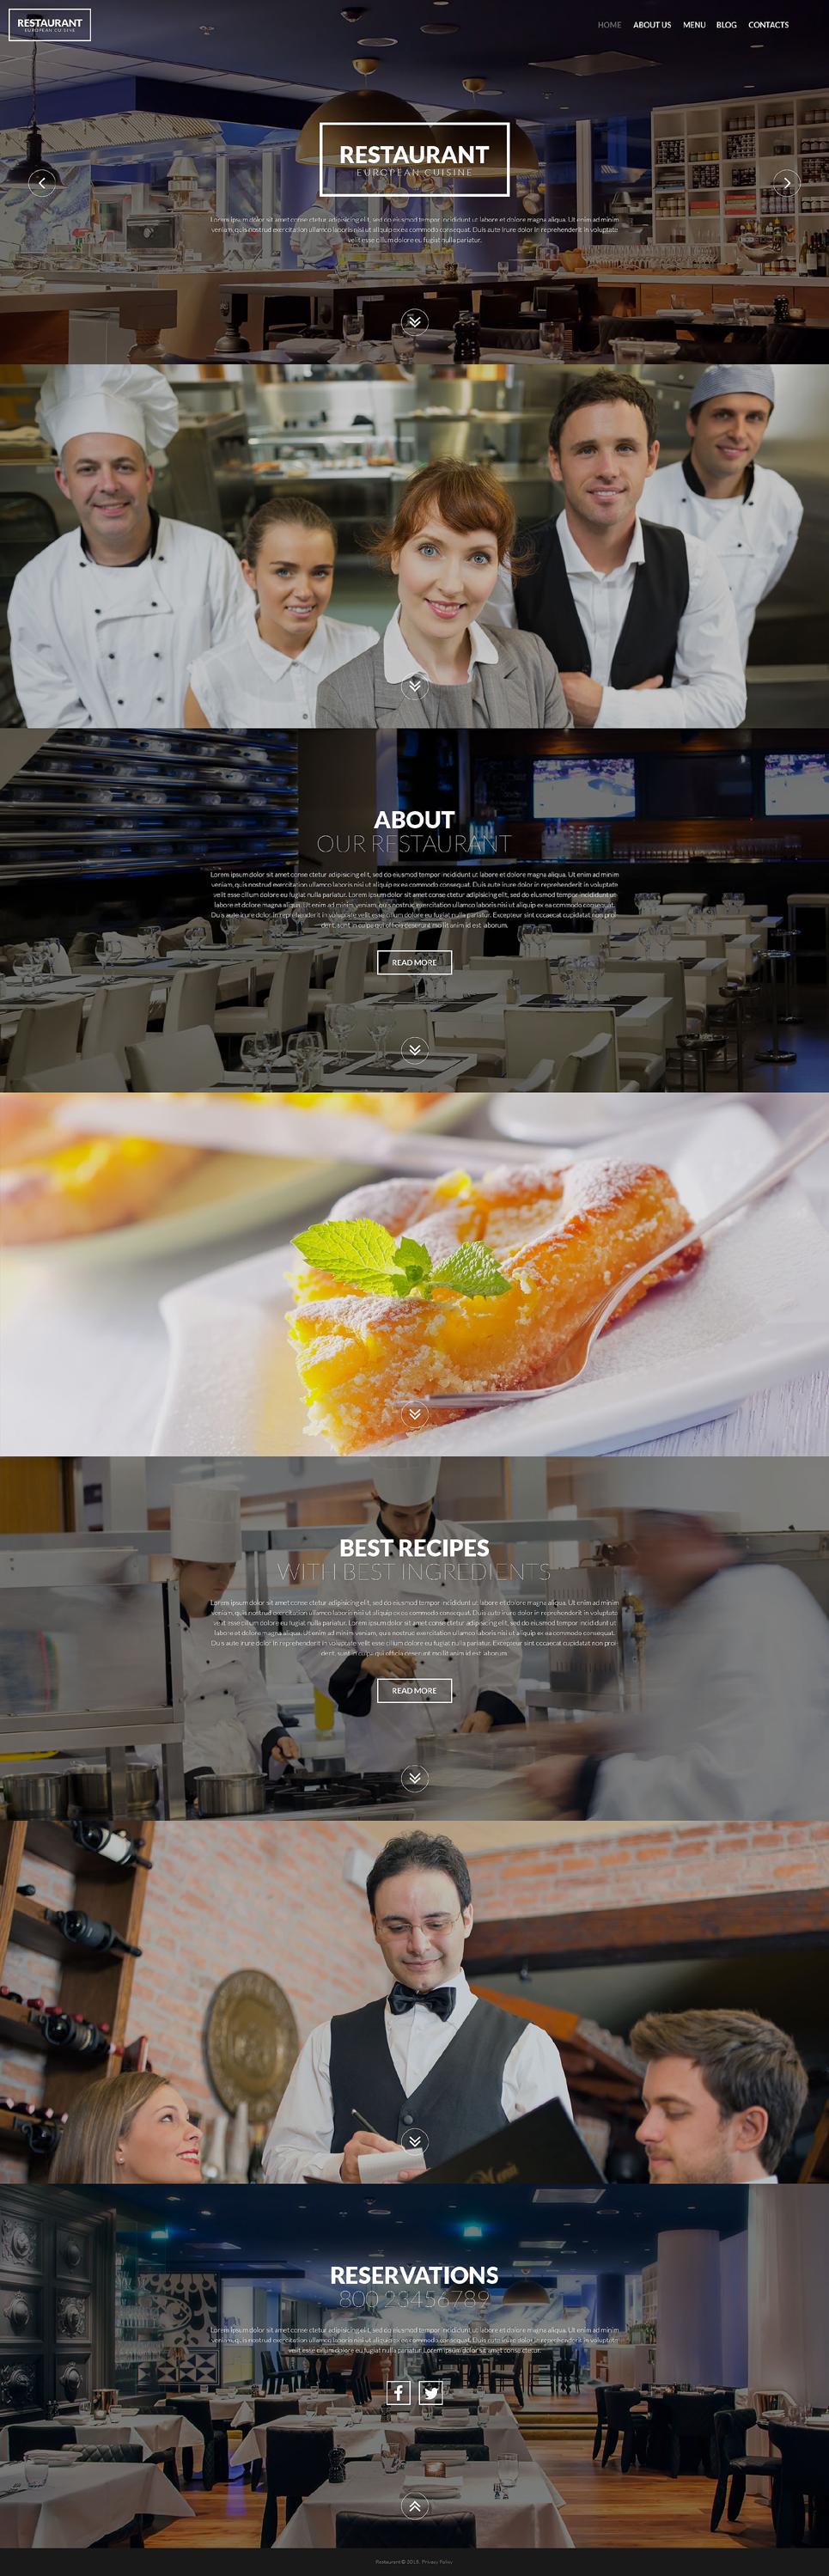 Адаптивный шаблон сайта на тему европейский ресторан #53589